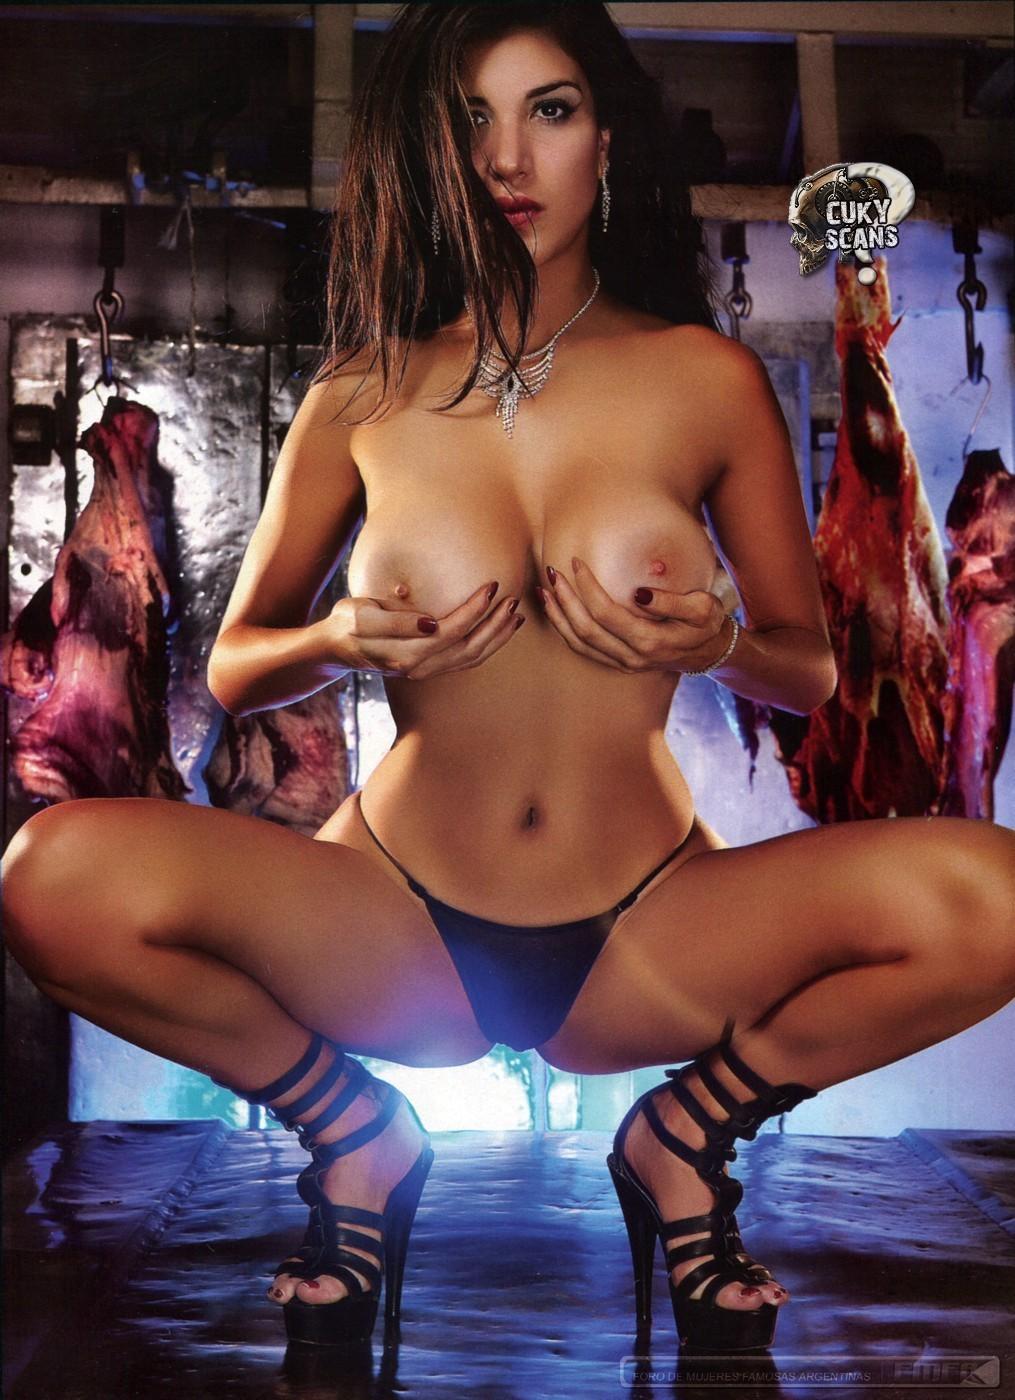 Andrea Rincon Dsnuda andrea rincón nude naked pics and videos imperiodefamosas